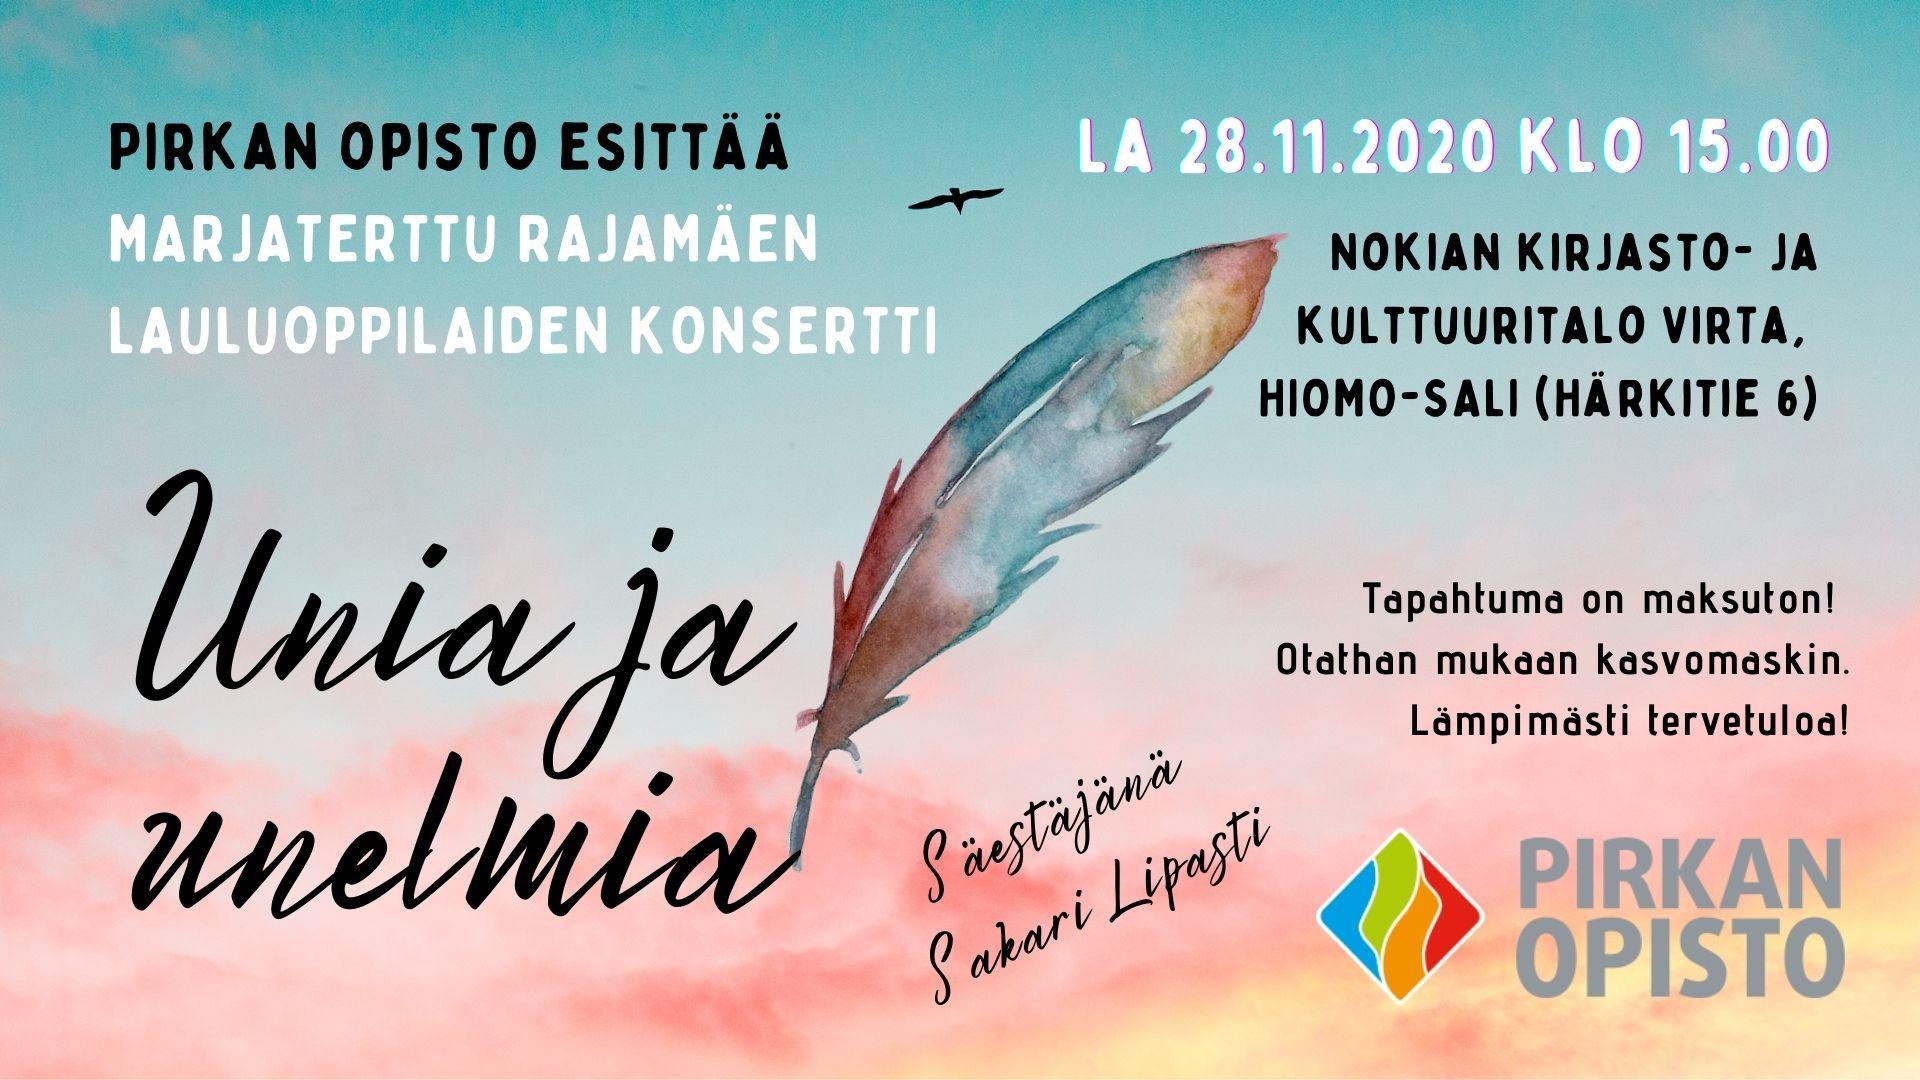 Konserttimainos: Laulajien konsertti Unia ja unelmia 28.11.2020